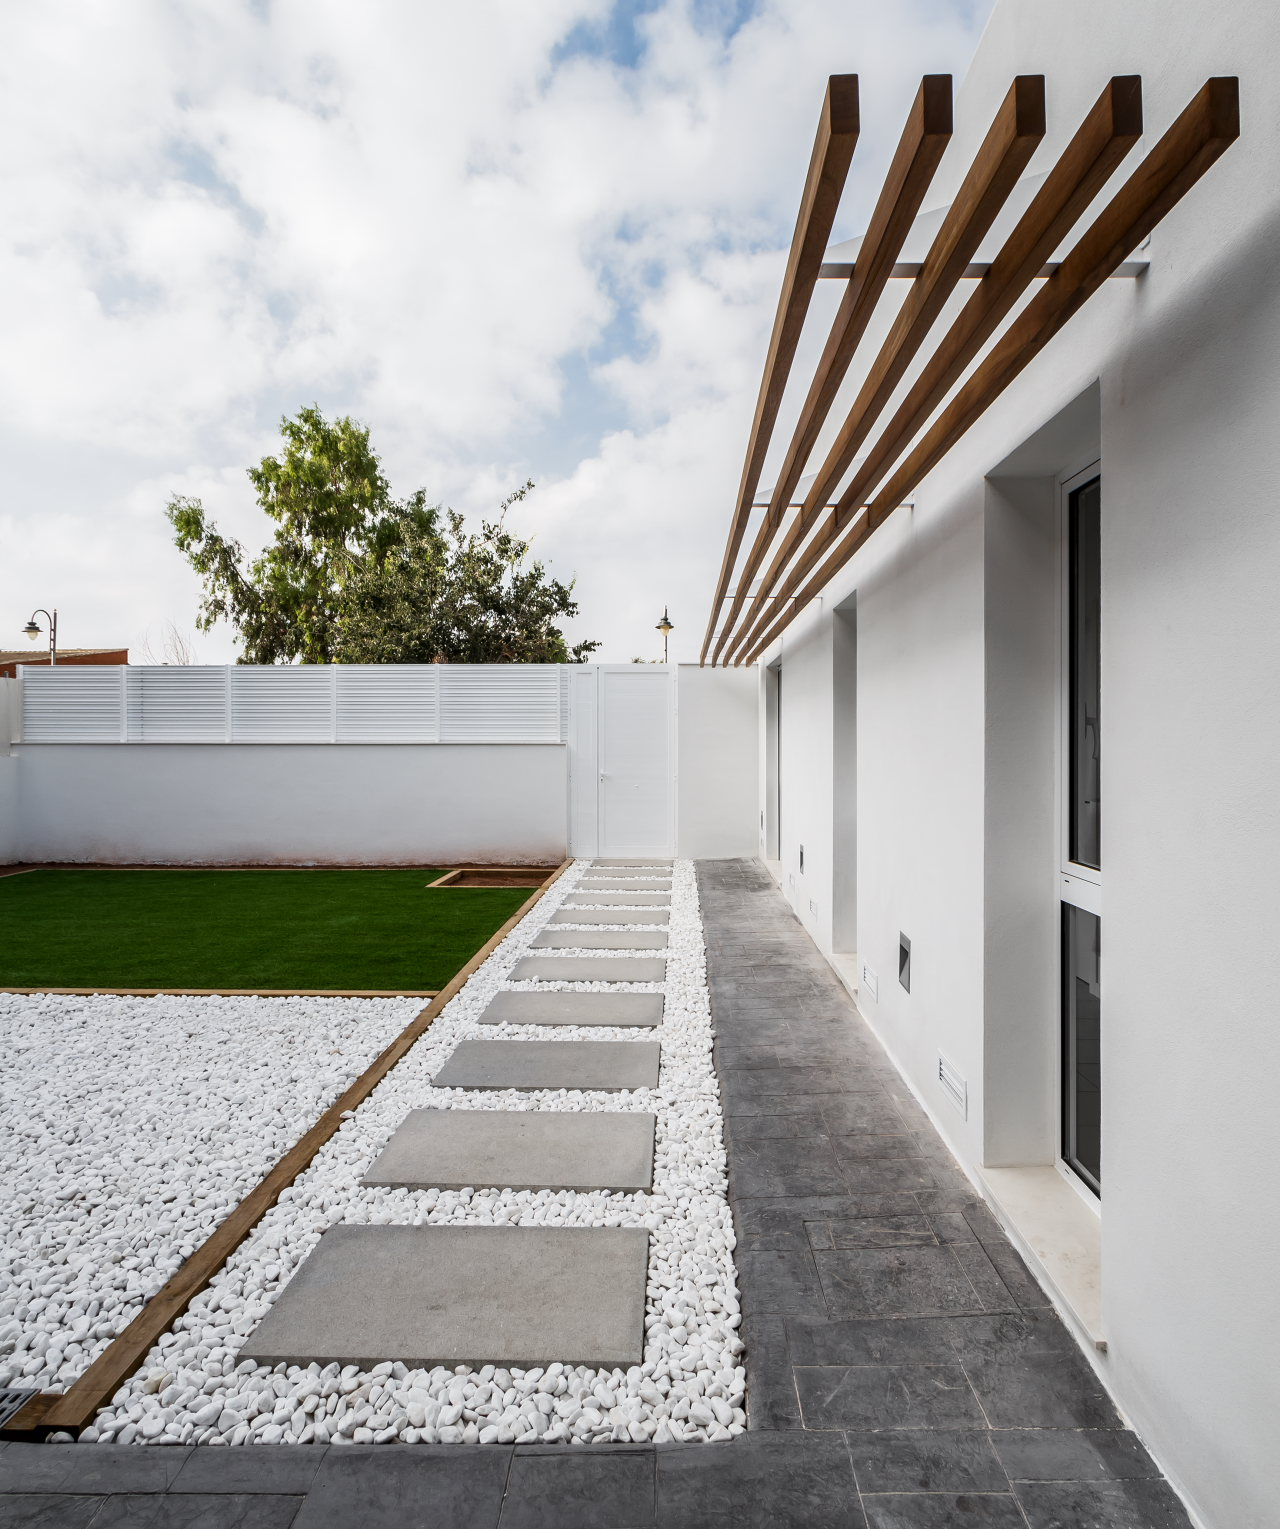 fotografia-arquitectura-valencia-german-cabo-viraje-museros (18)